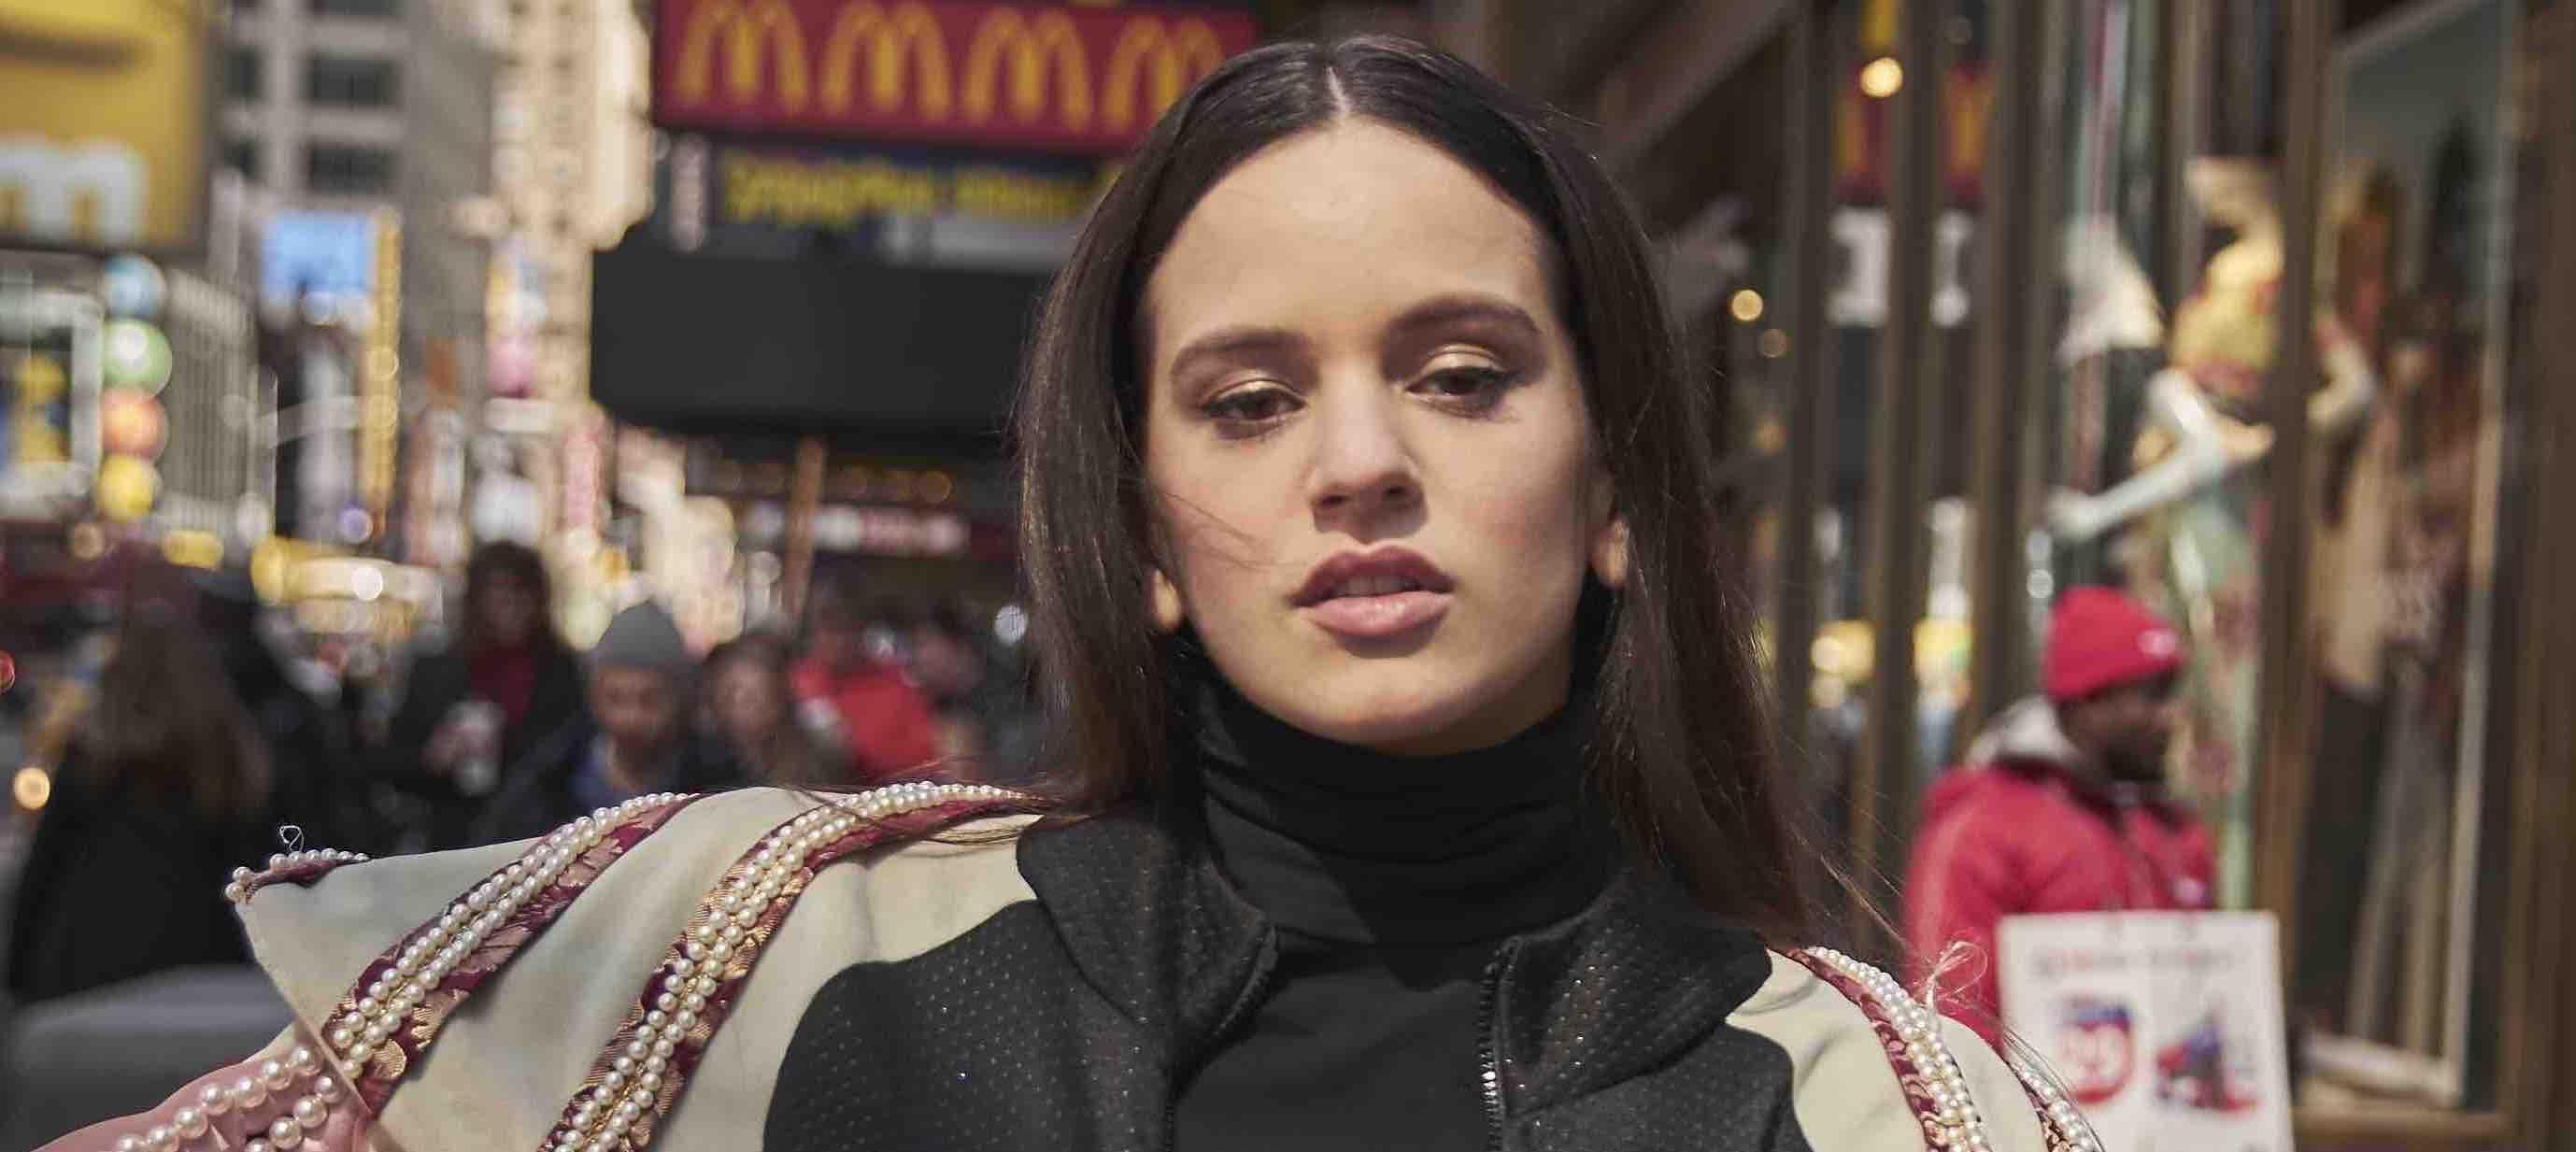 Rosalía Sings Alongside Penélope Cruz in New Trailer for Pedro Almodóvar's 'Pain & Glory'